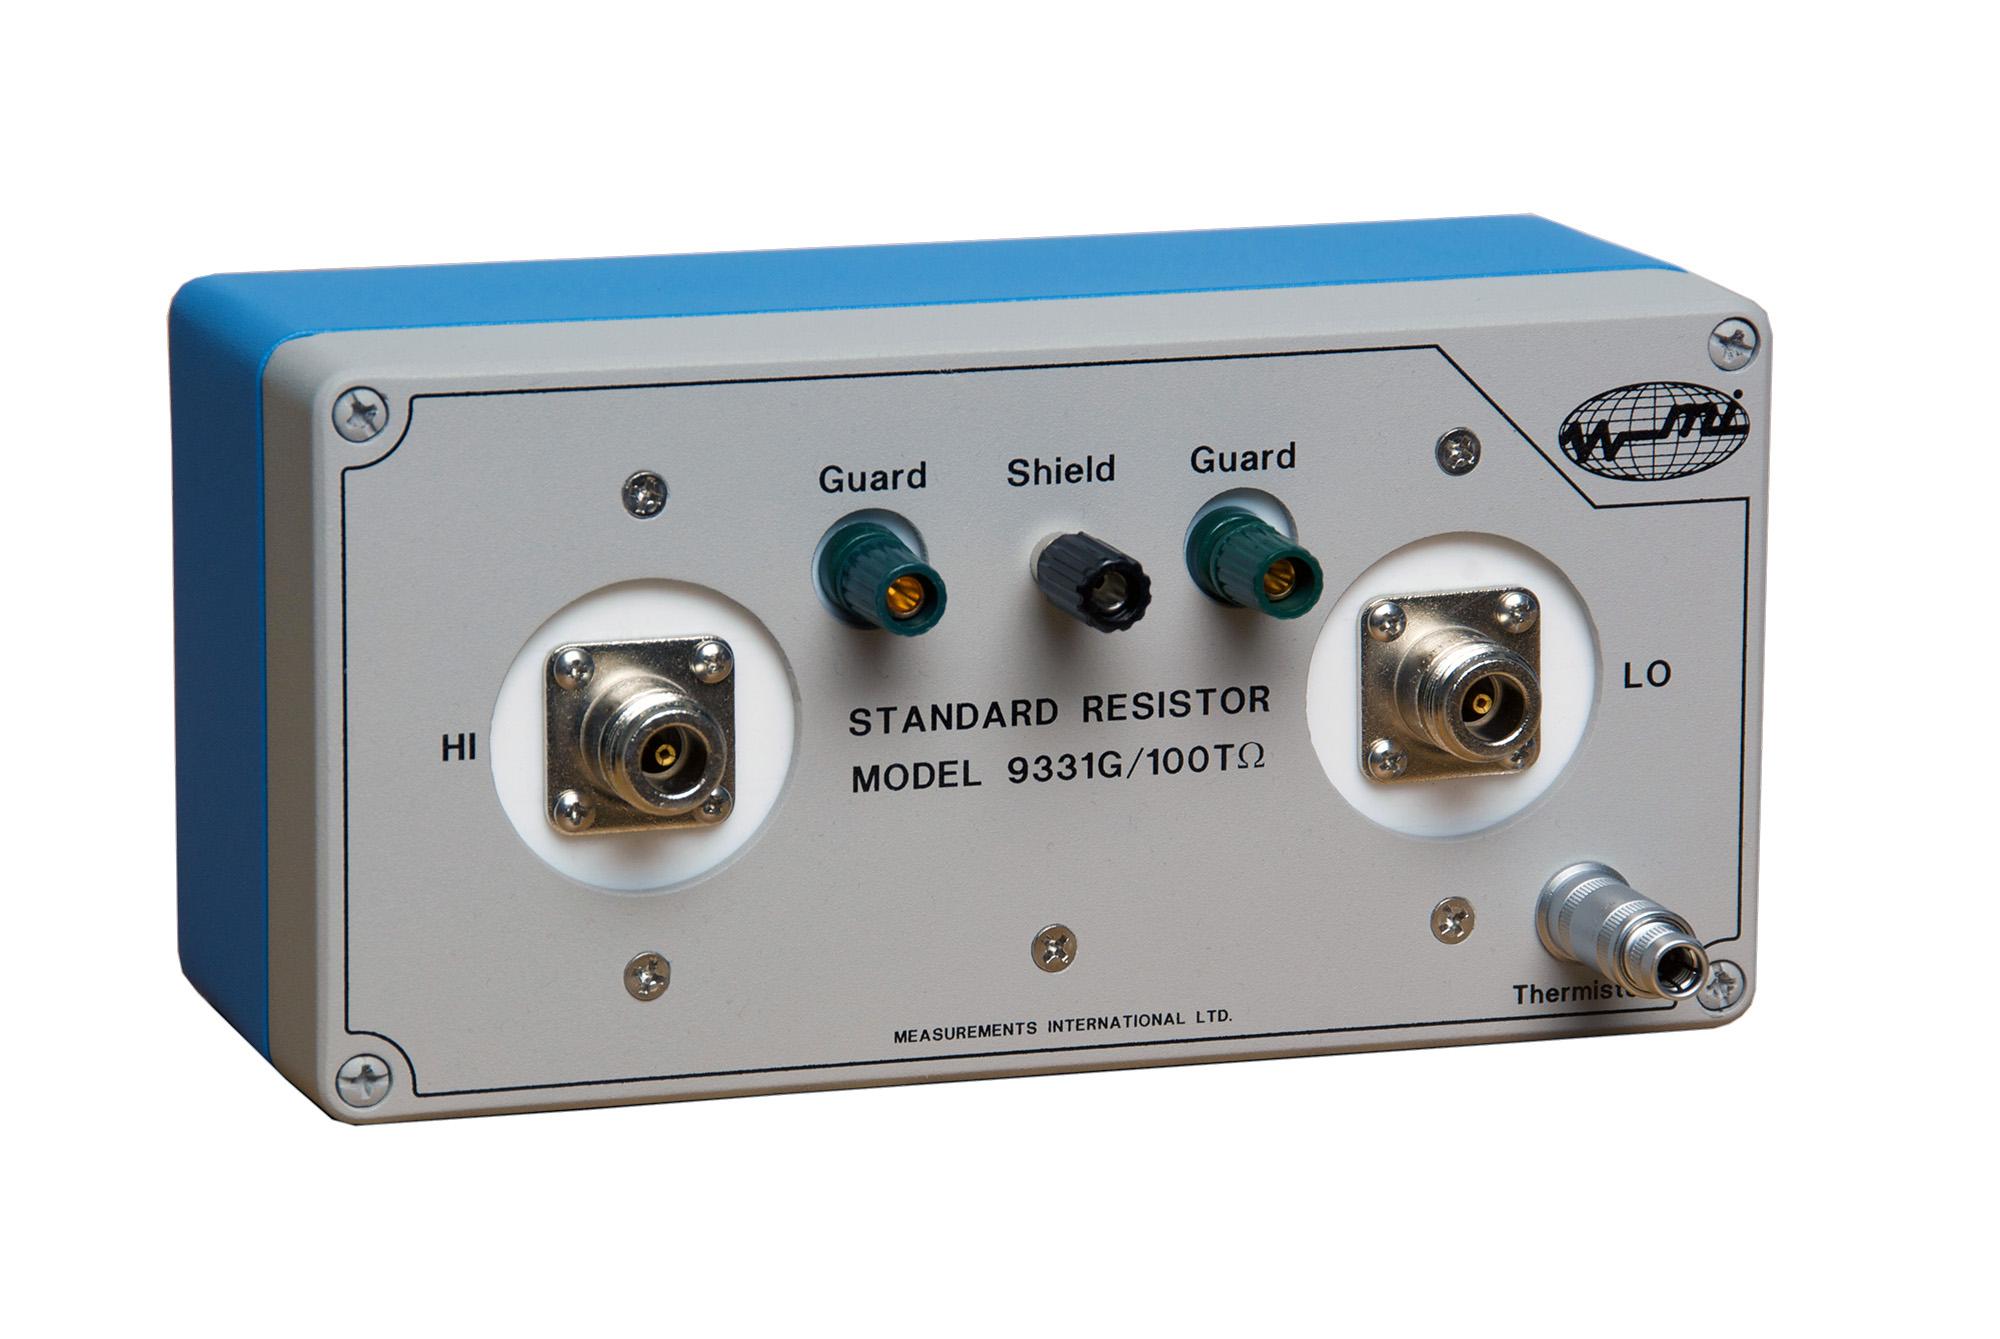 9331G/100T Standard Resistor